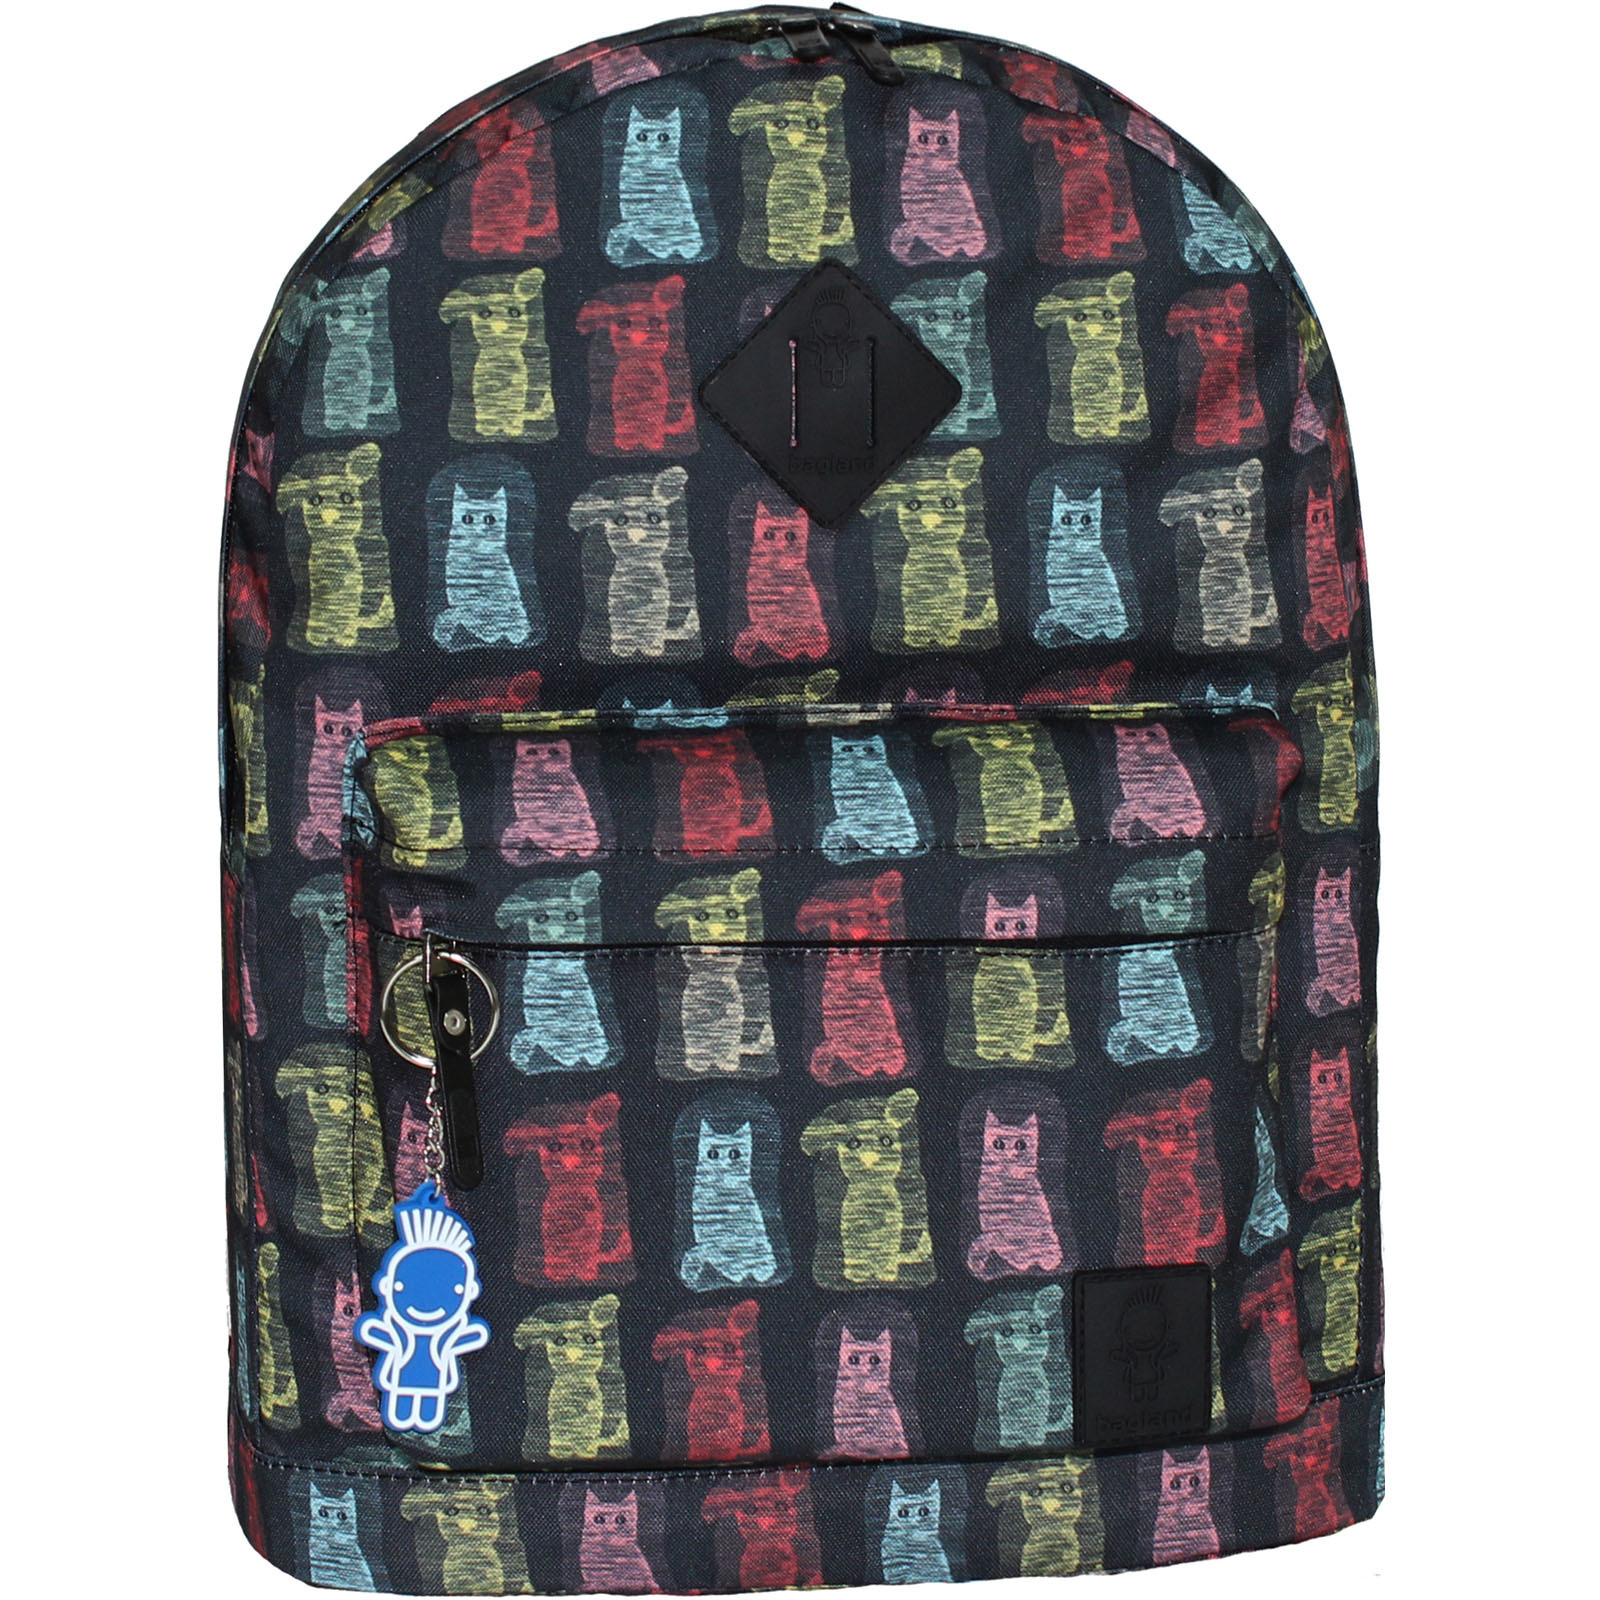 Городские рюкзаки Рюкзак Bagland Молодежный (дизайн) 17 л. сублимация 189 (00533664) IMG_7082_189.JPG